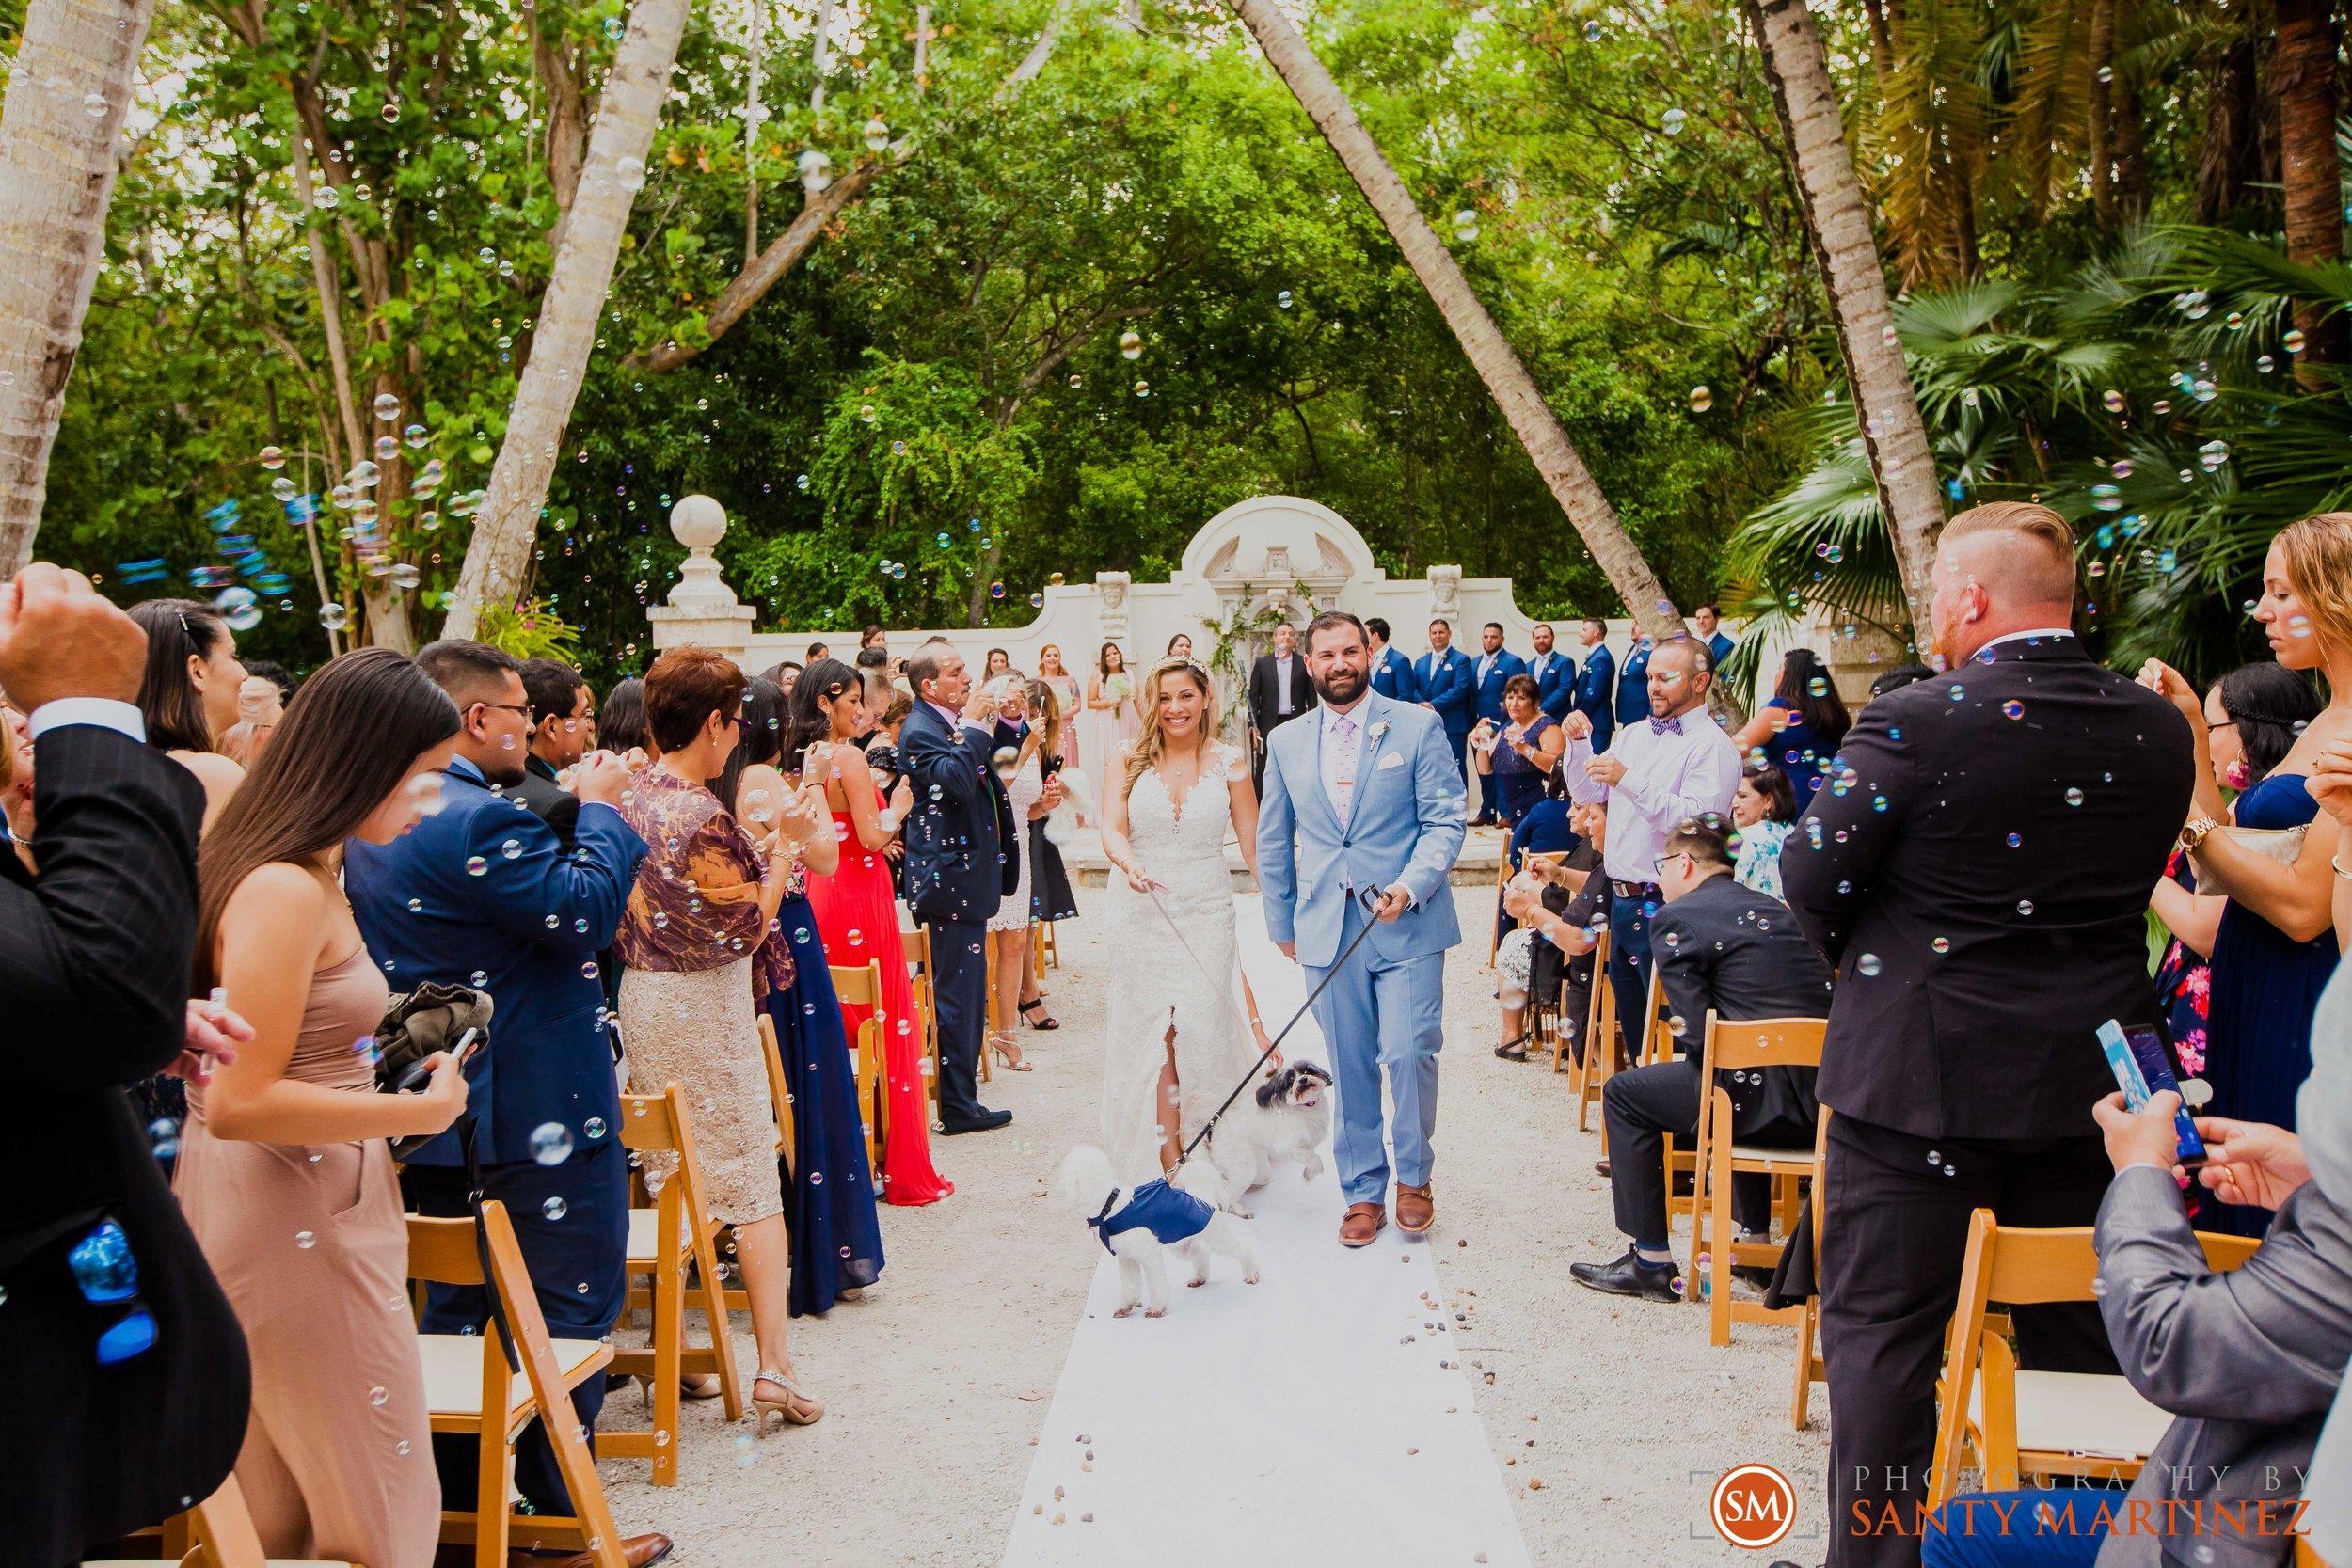 Wedding Bonnet House - Santy Martinez Photography-38.jpg